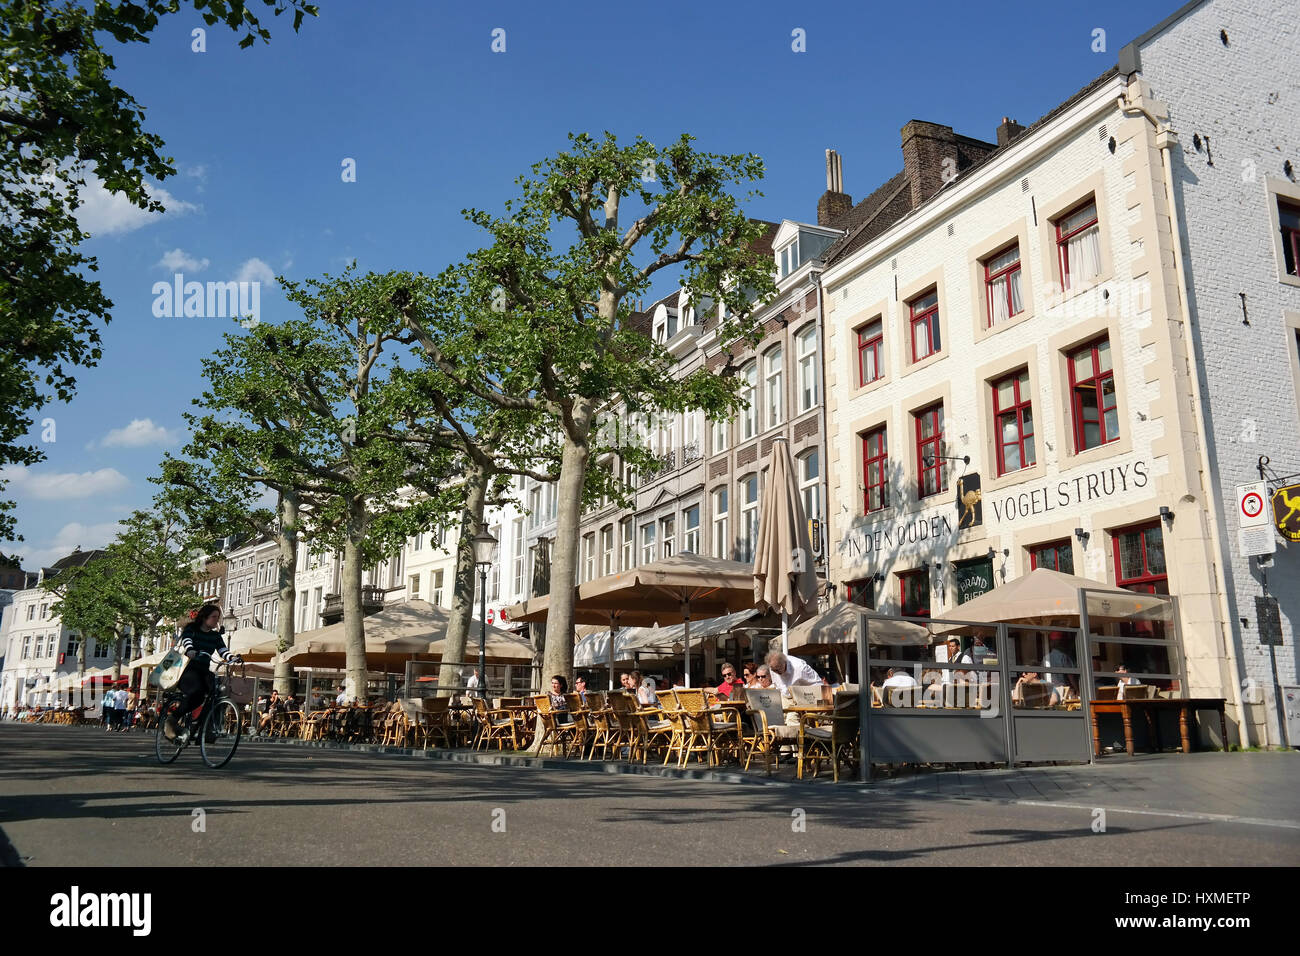 Vrijthof maastricht netherlands restaurant bar stock - Maastricht mobel ...